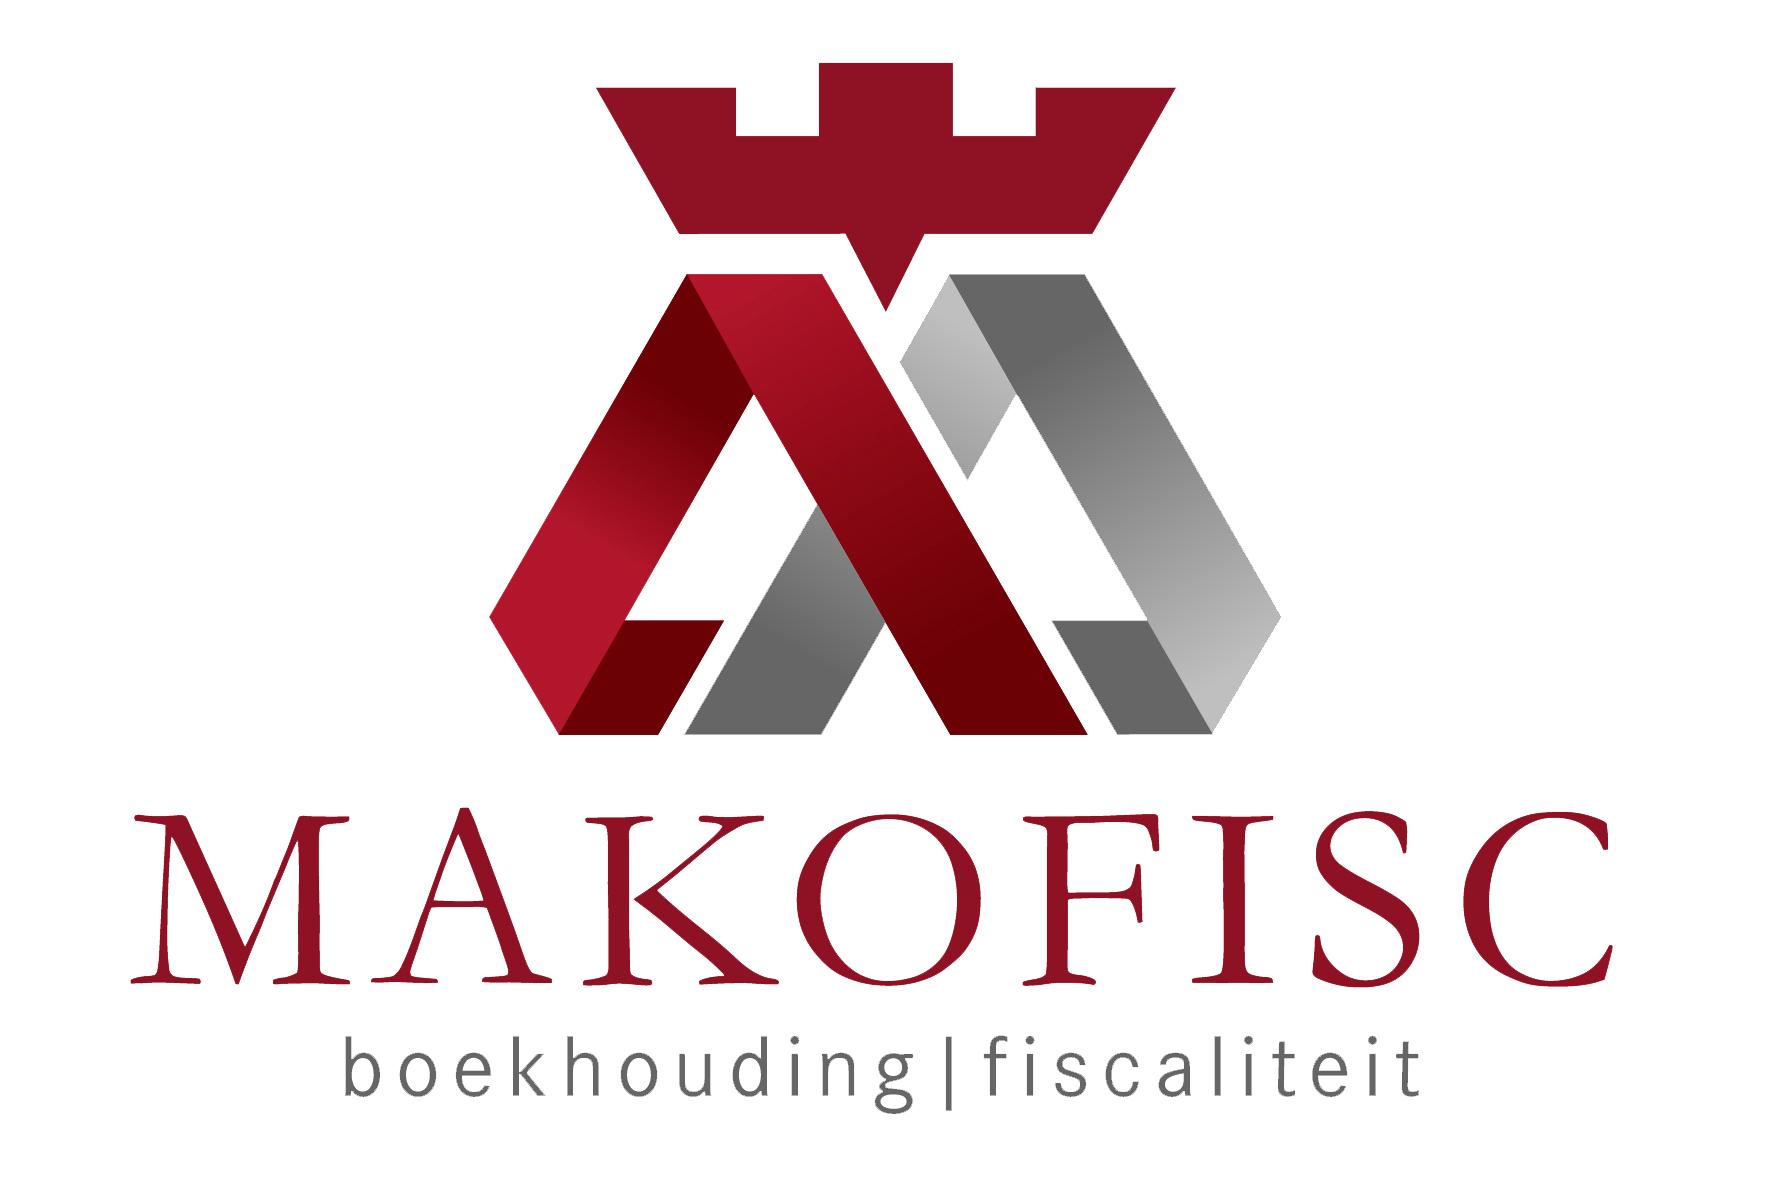 Makofisc